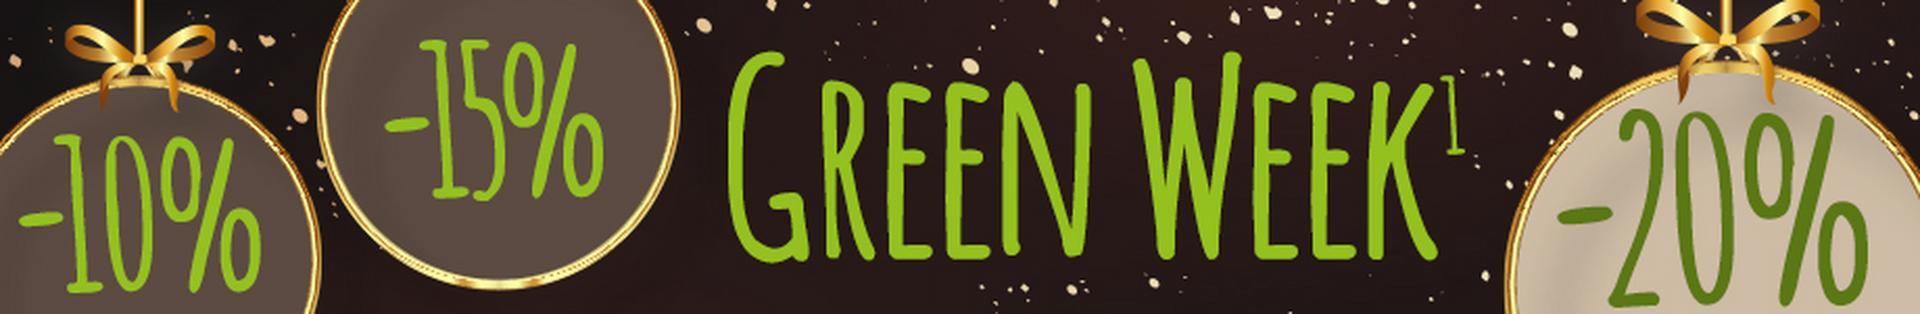 le_listing_banner_greenweek_112020_xs